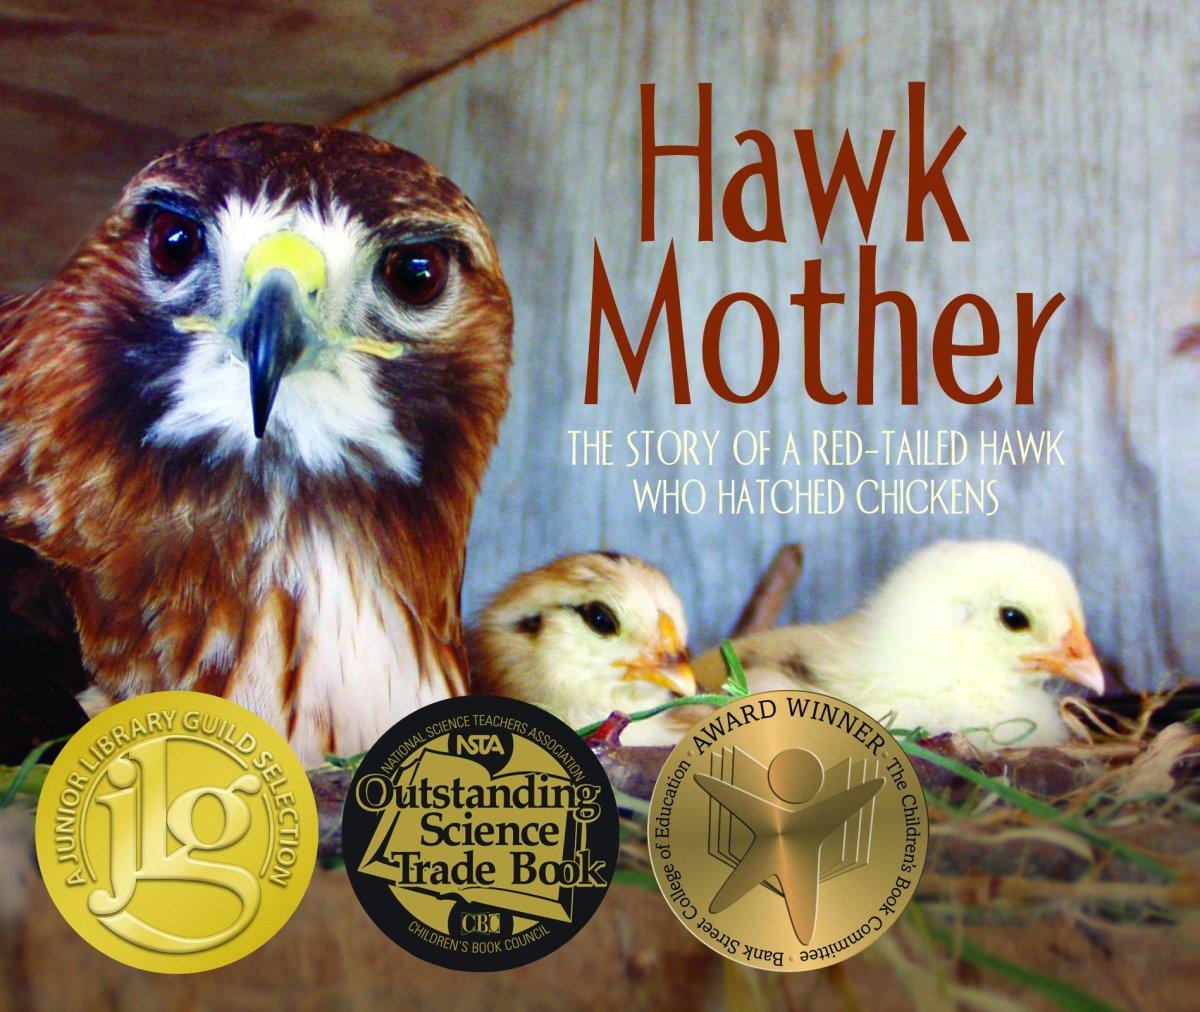 Hawk Mother by Kara Hagedorn